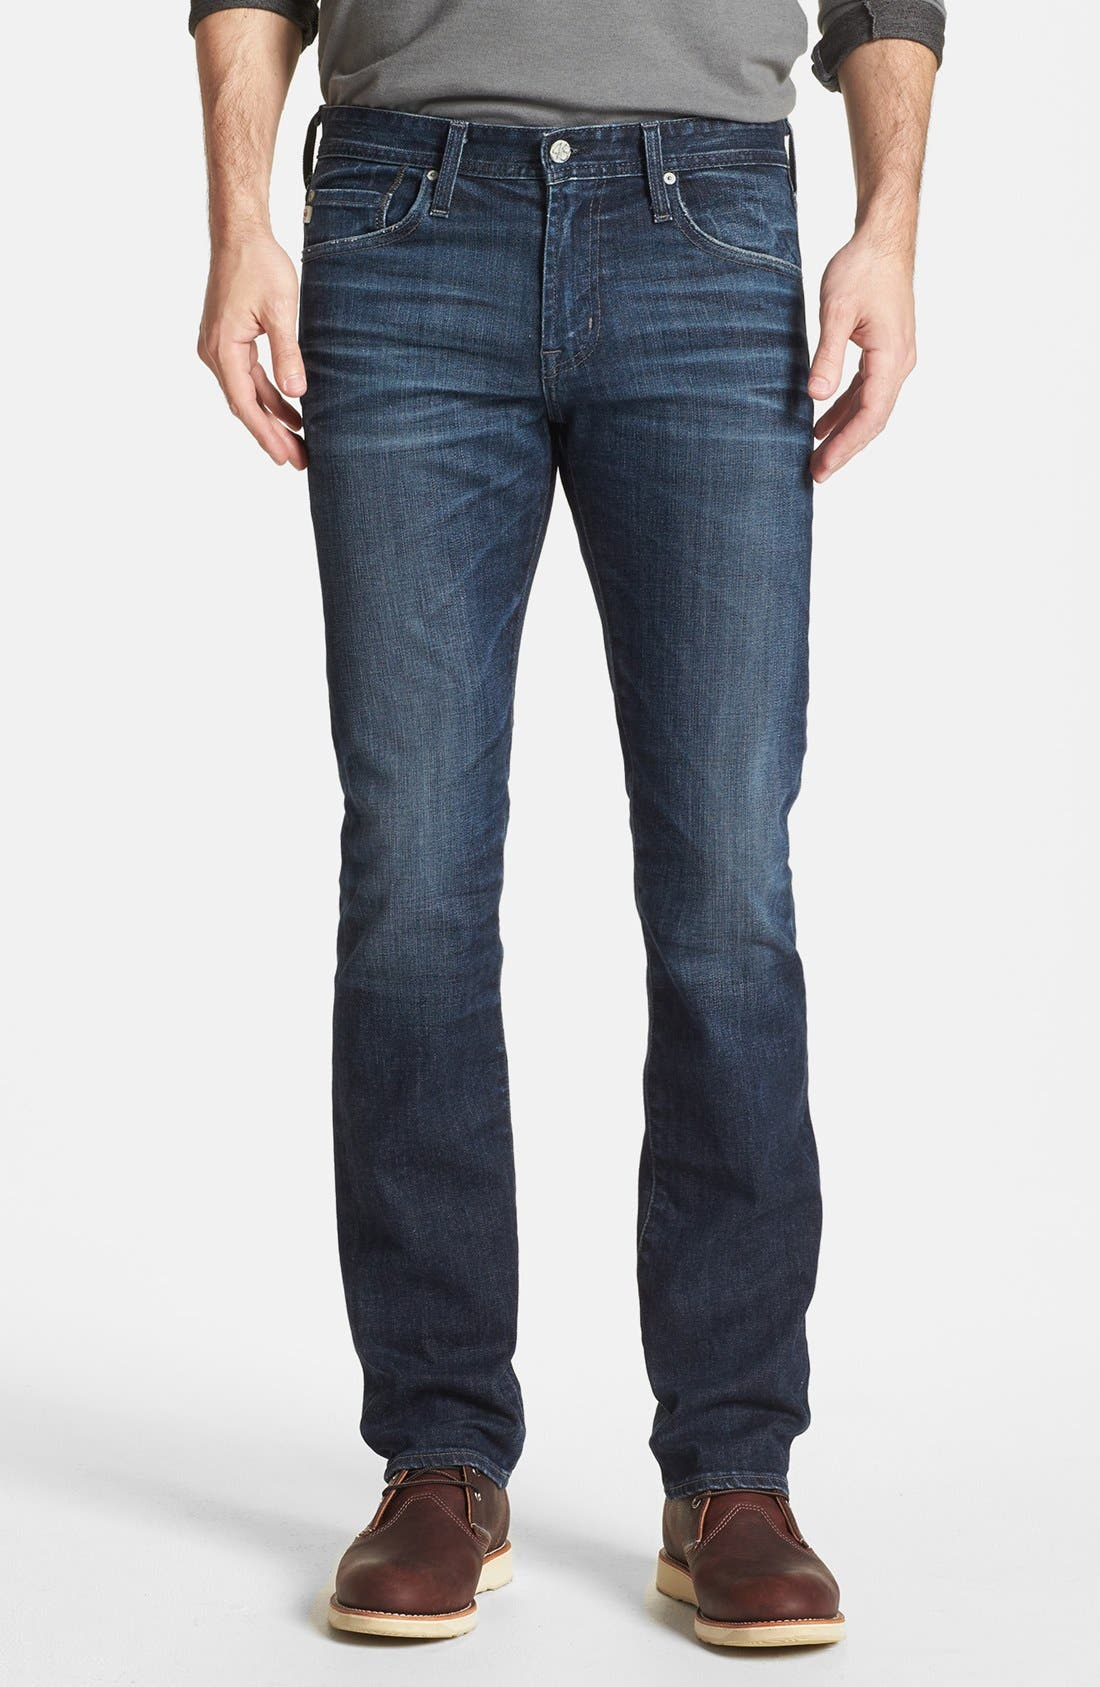 Main Image - AG 'Matchbox' Slim Fit Jeans (Six Years Cast)